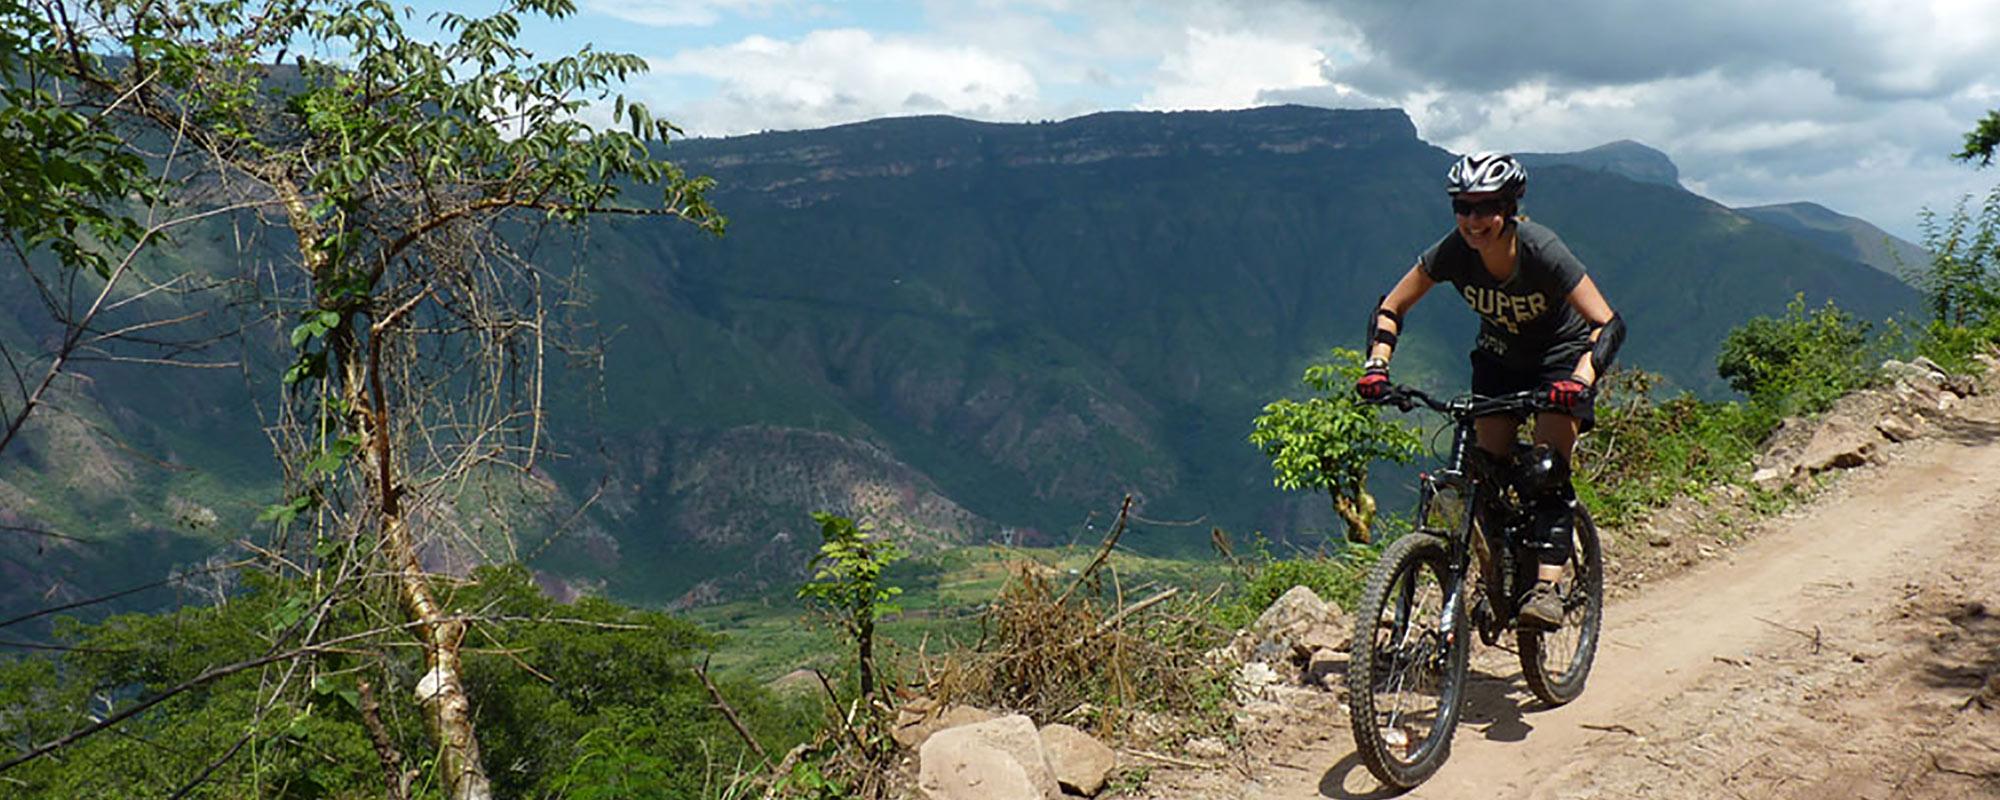 chicamocha-banner-03 Chicamocha Canyon and Jordan, 1 Day